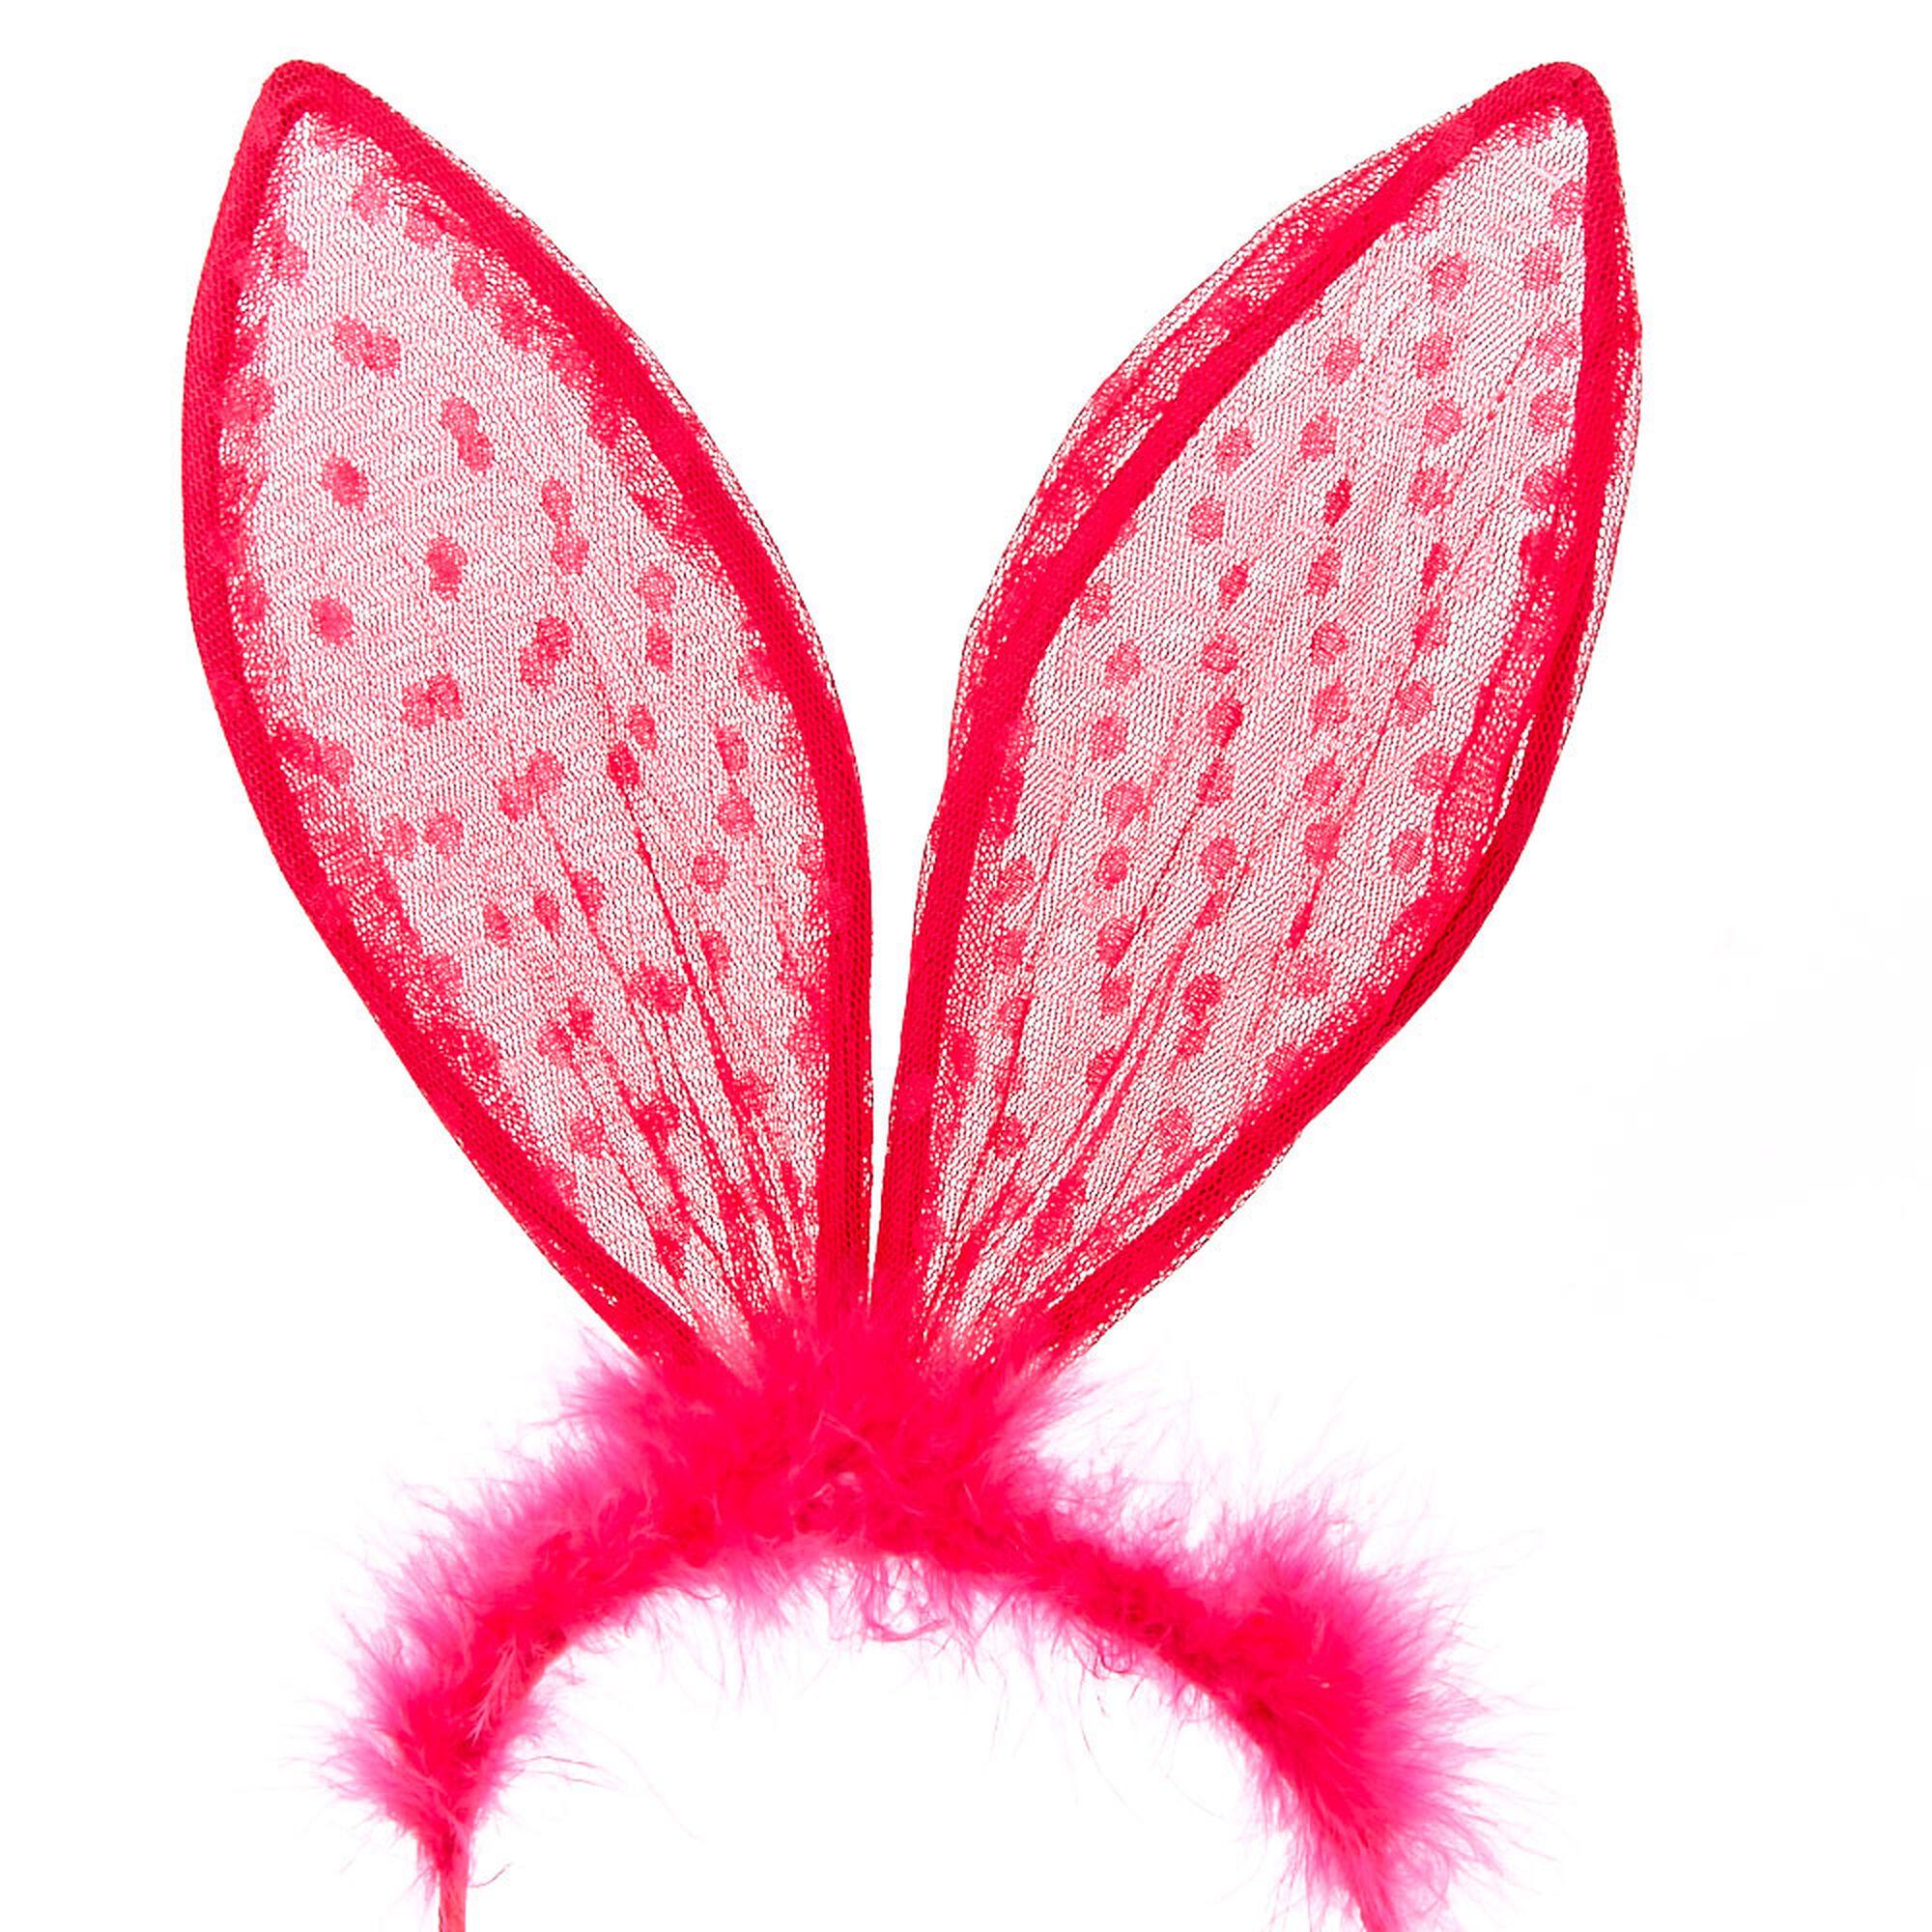 Pink Polka Dot Lace Bunny Ears Headband   Claire's